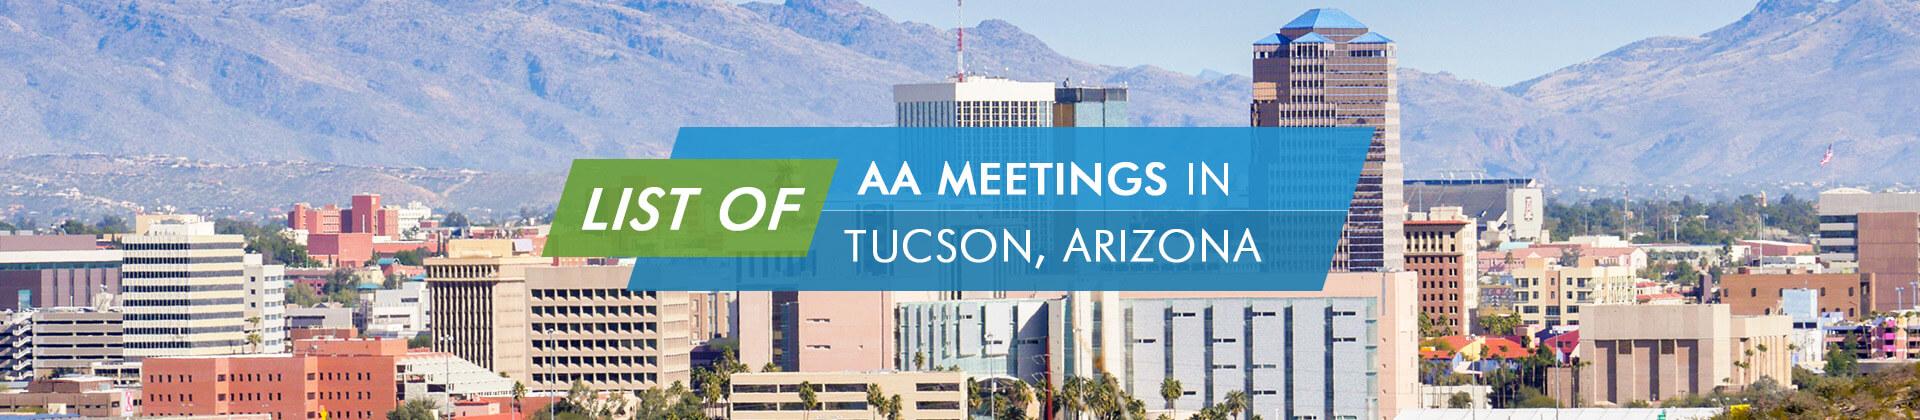 AA Meetings Tucson Arizona